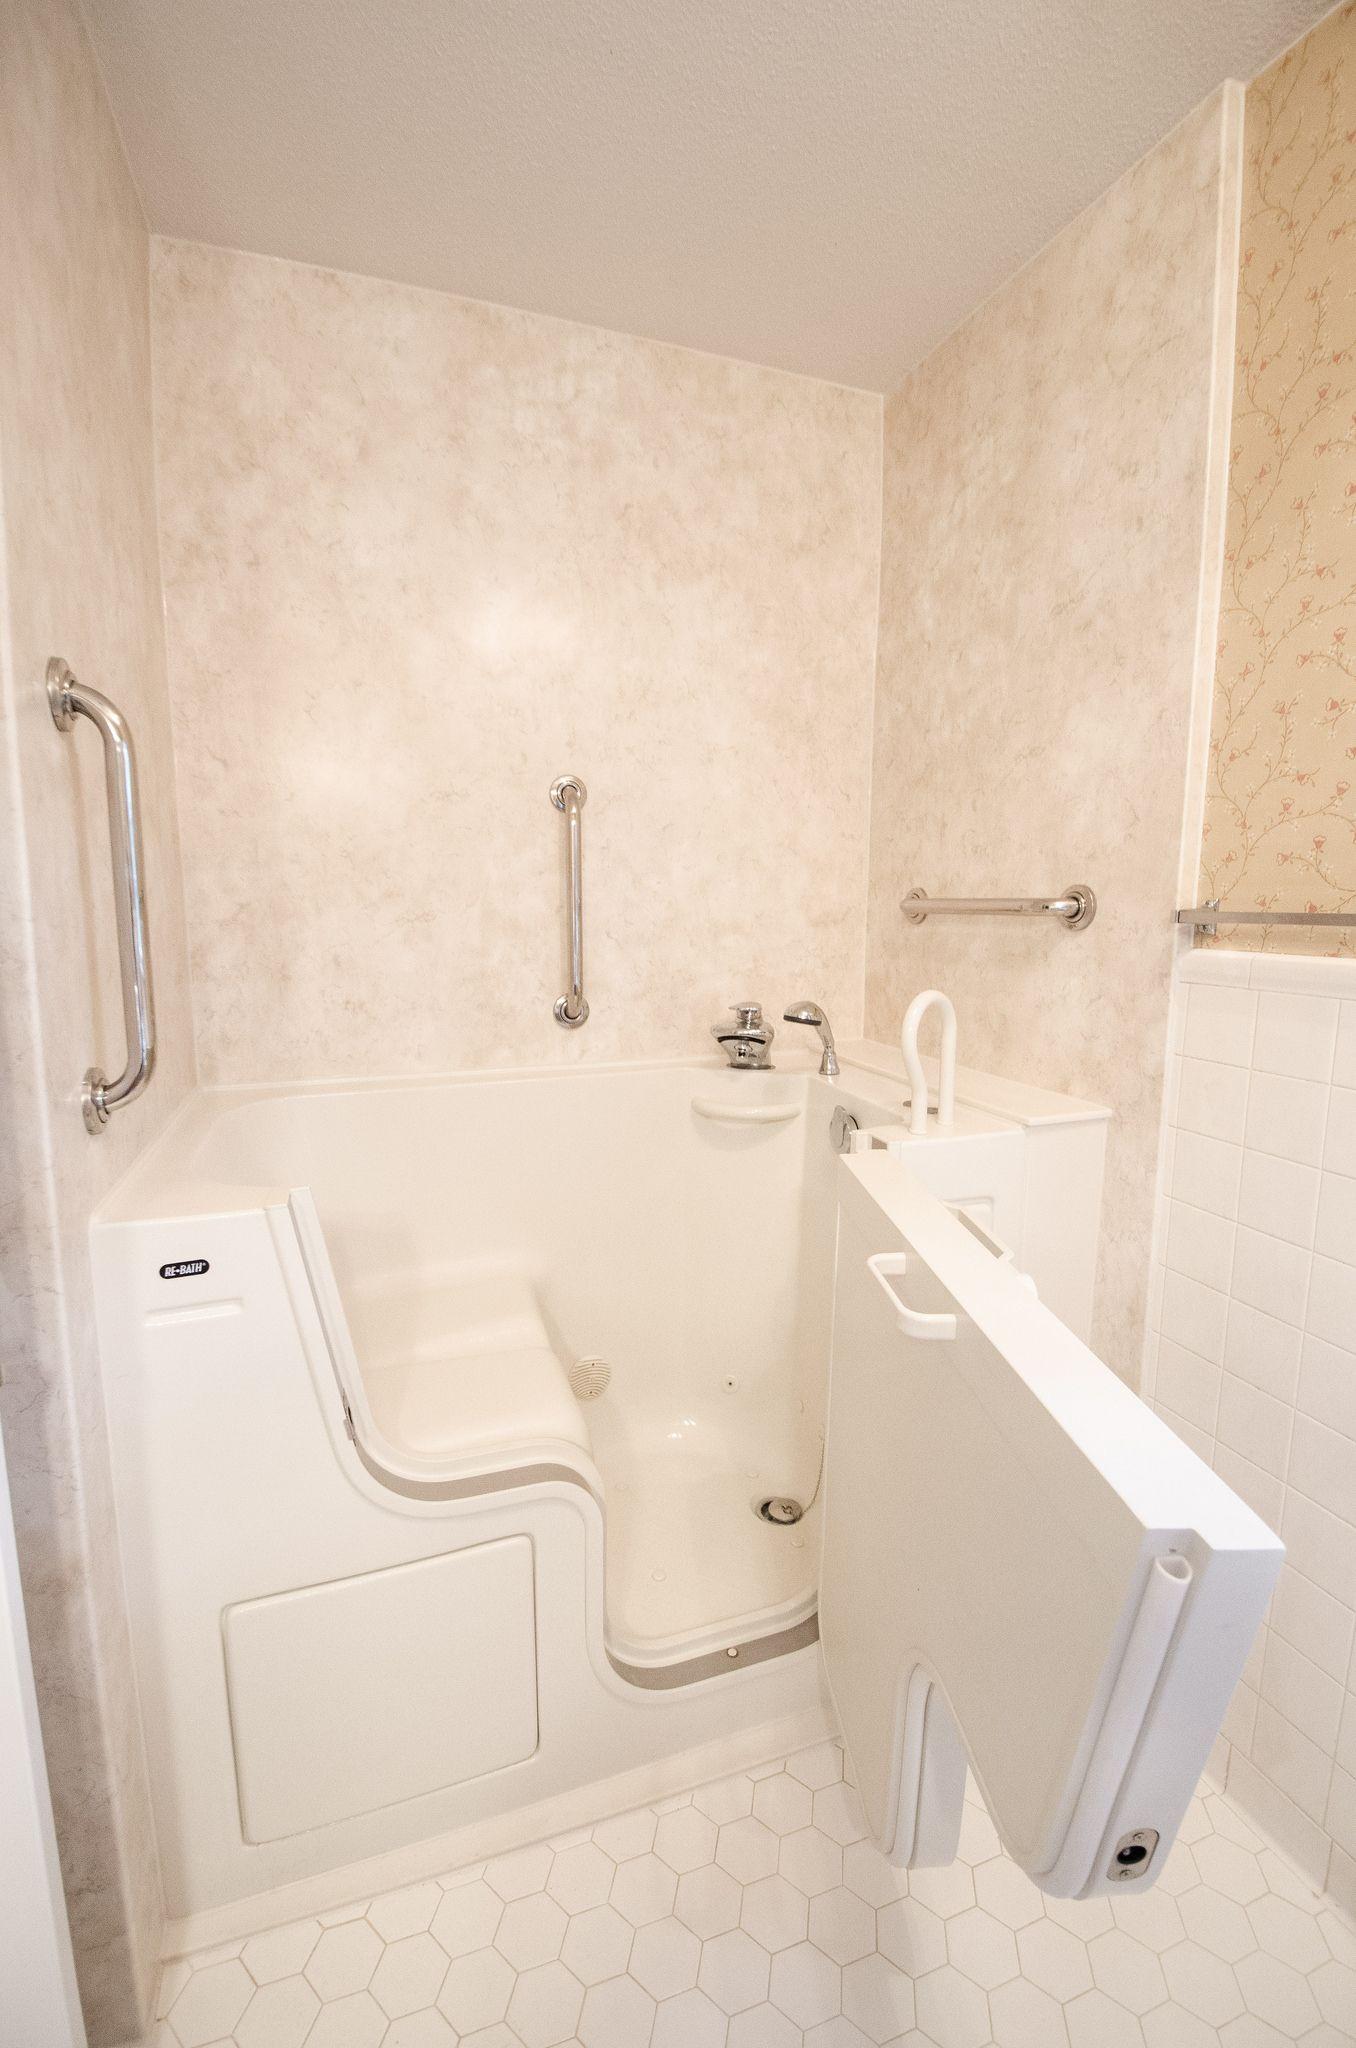 CN613 After1 Bathtub, Handicap bathroom, Bath remodel